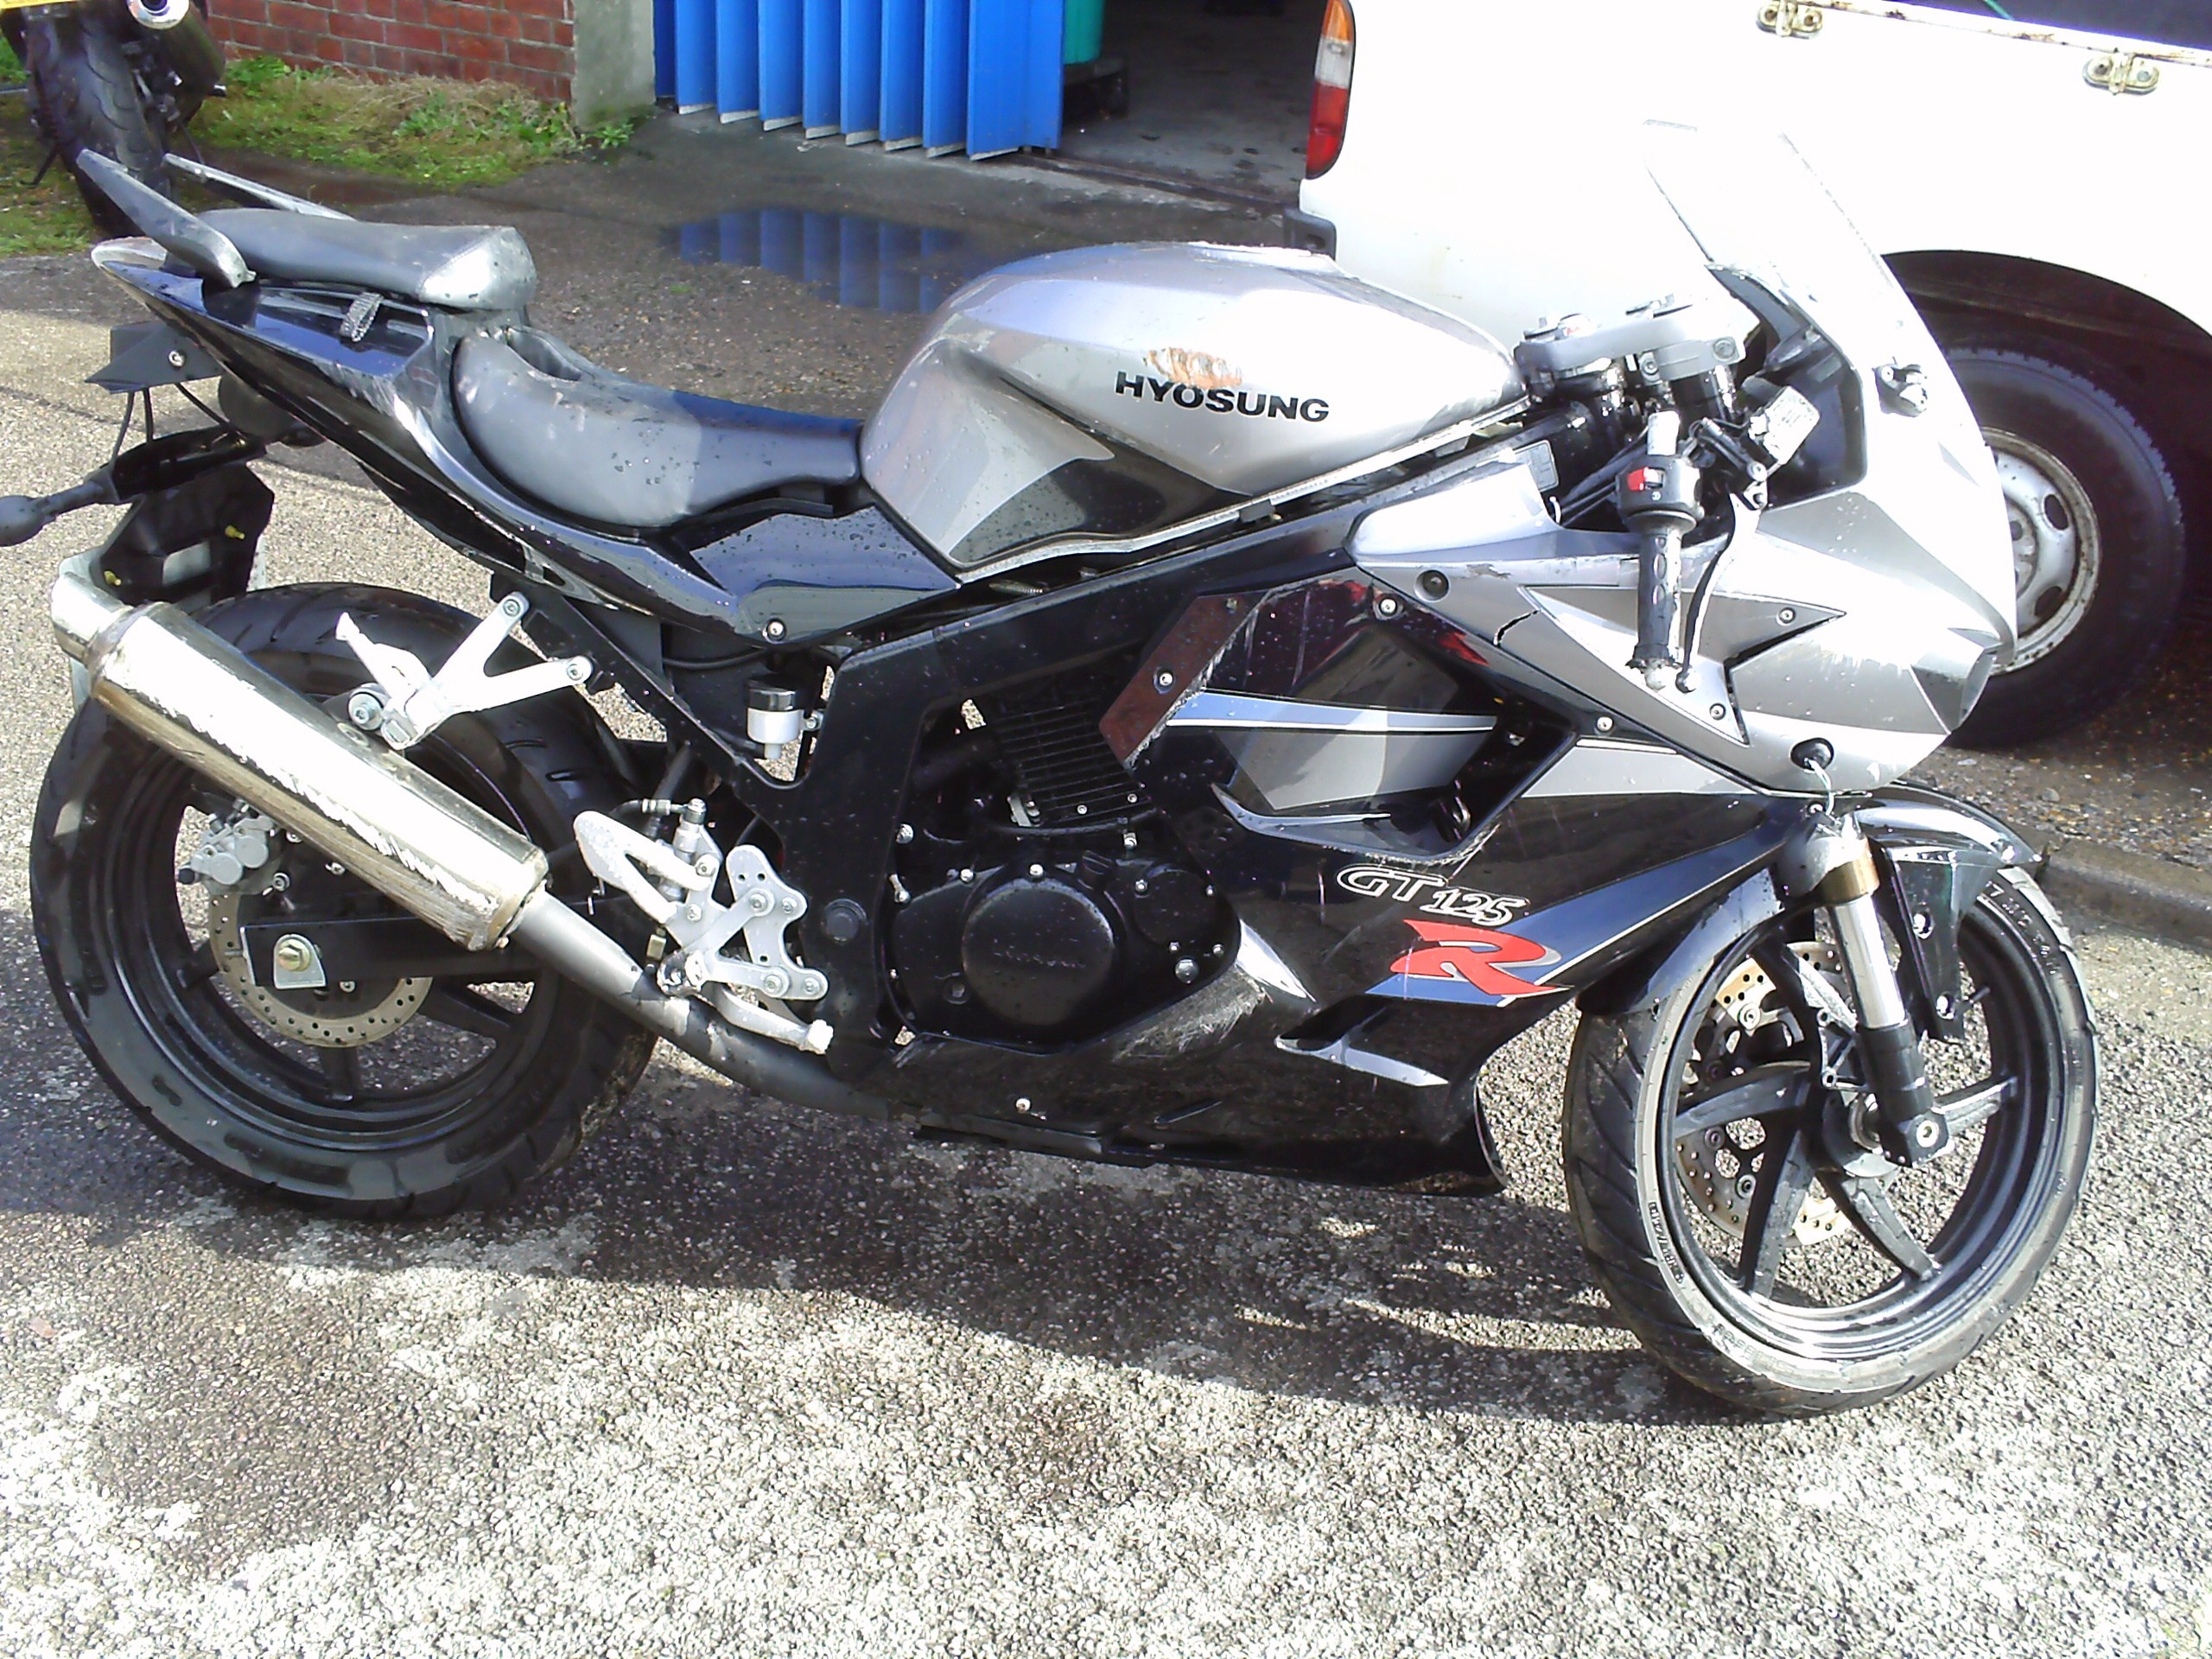 Sold!! Hyosung gt125r   in Sherwood, Nottinghamshire   Gumtree